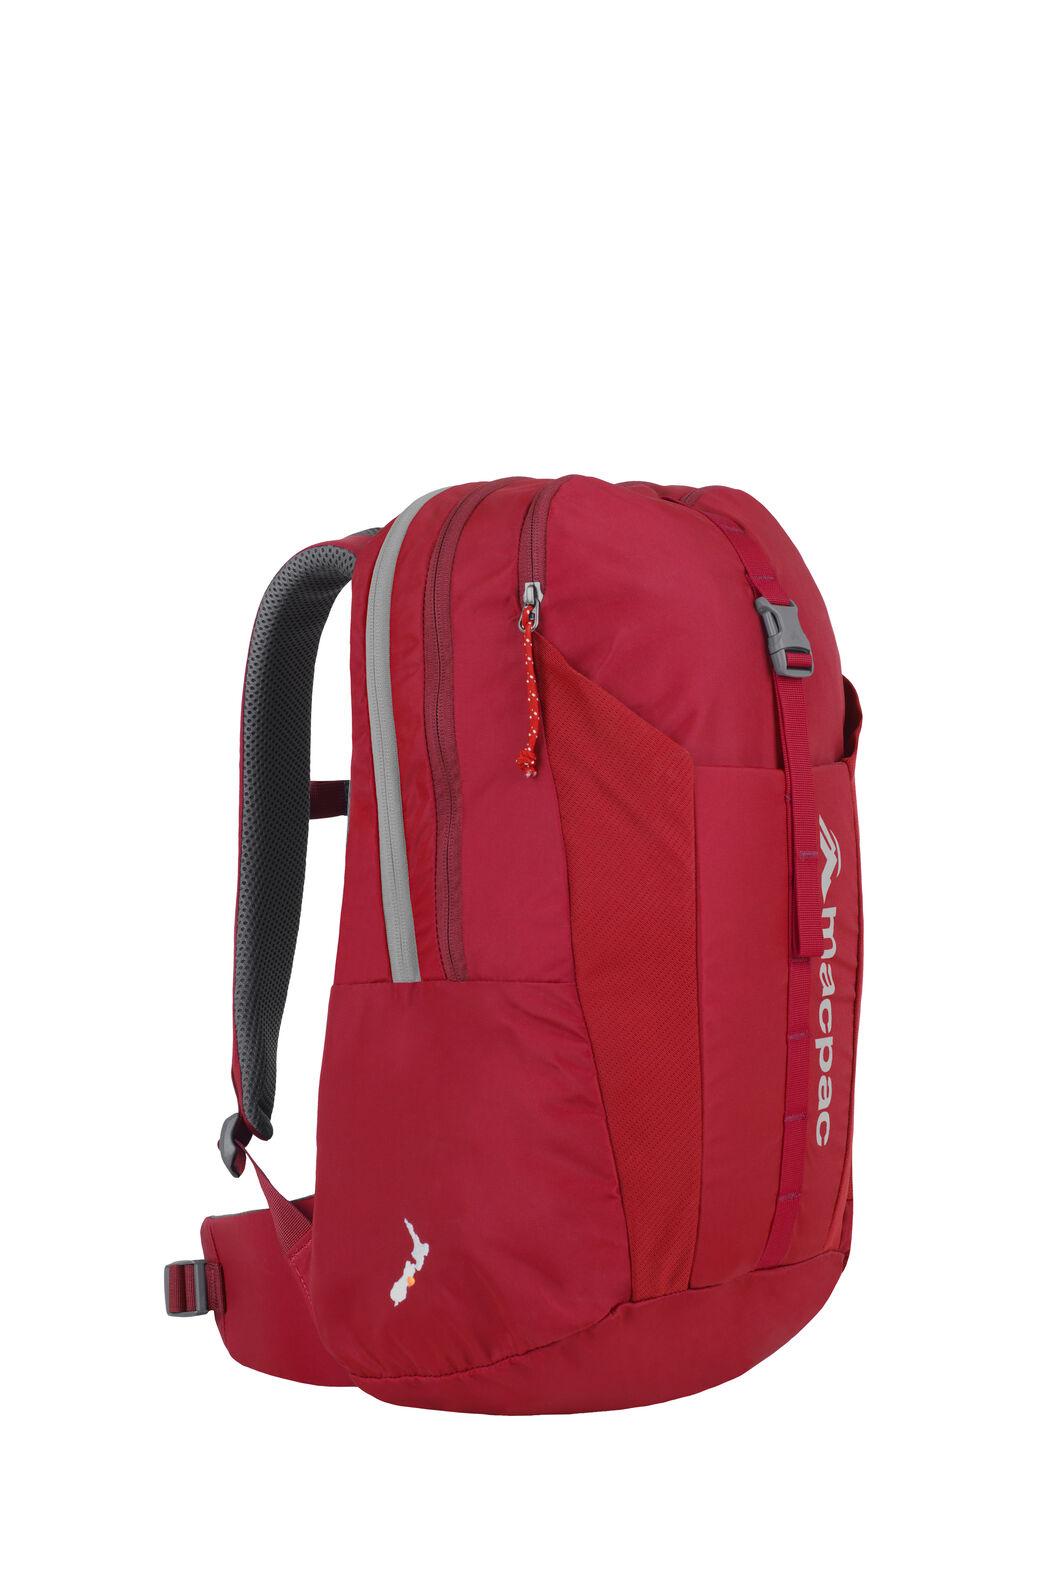 Macpac Summit Ridge 22L Daypack - Kids', Haute Red, hi-res